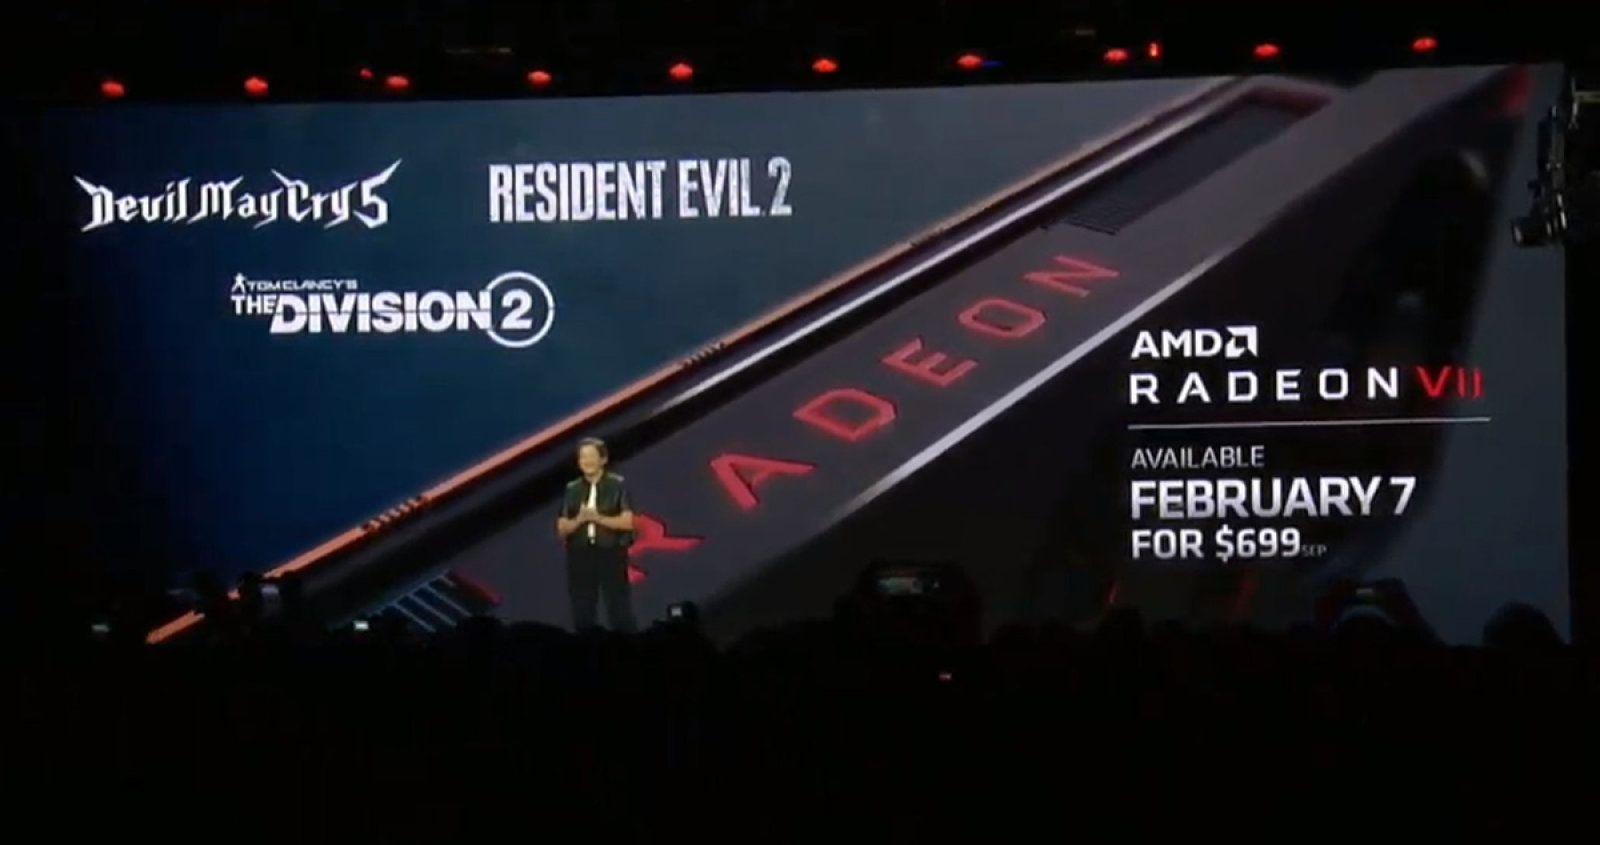 Radeon VII AMD Nvidia RTX 2080 Intel CES 2019